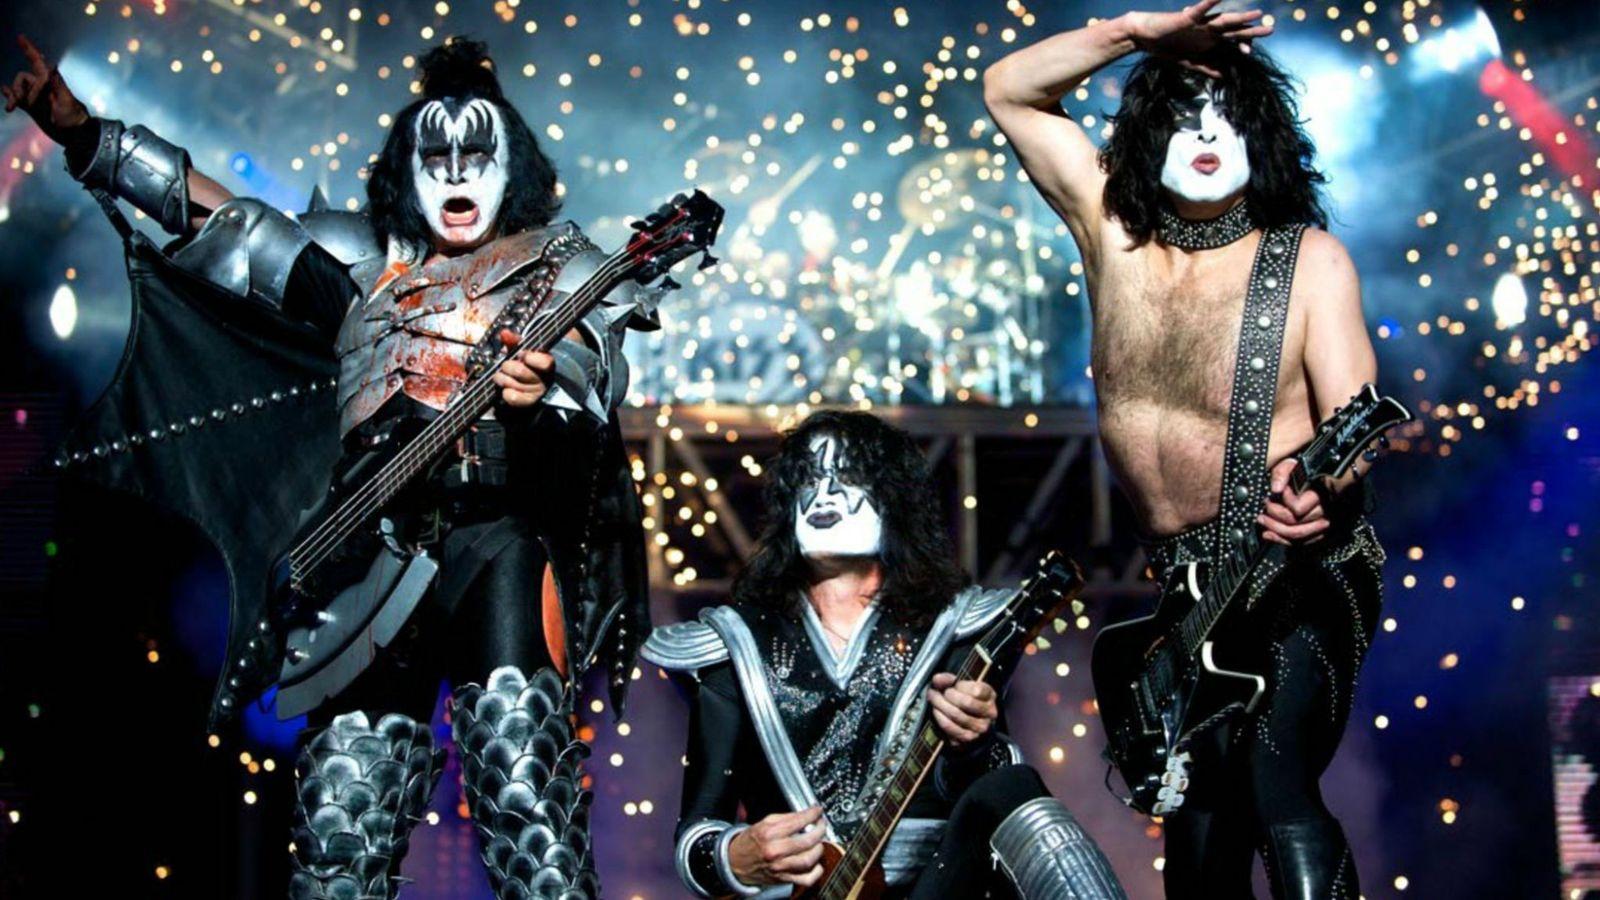 Kiss performing in Milan, Italy, 2008 by Denis O'Regan.jpg